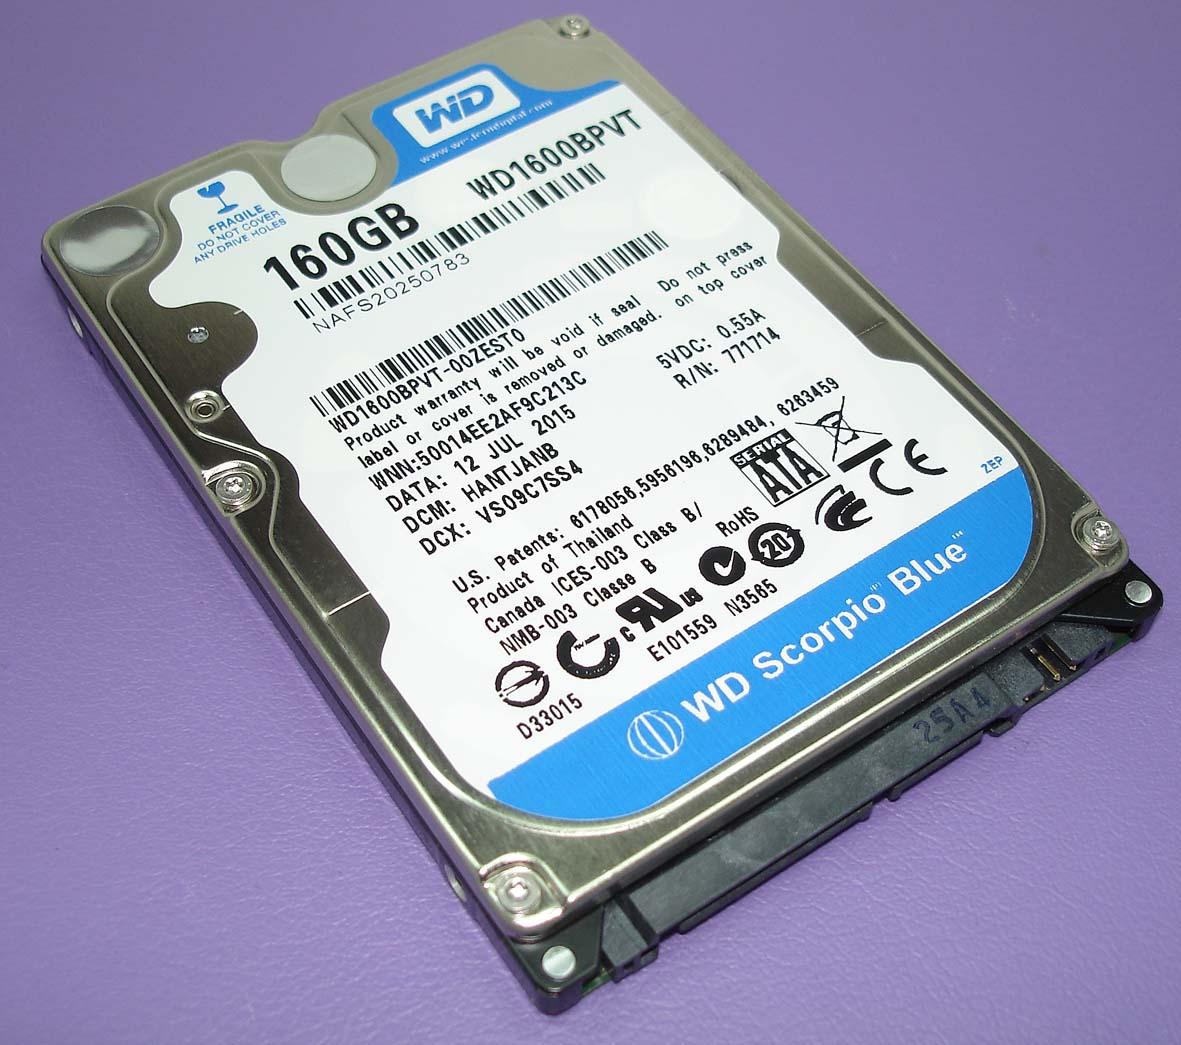 "Жесткий диск WD Scorpio Blue 2.5"", 160GB, SATA II"